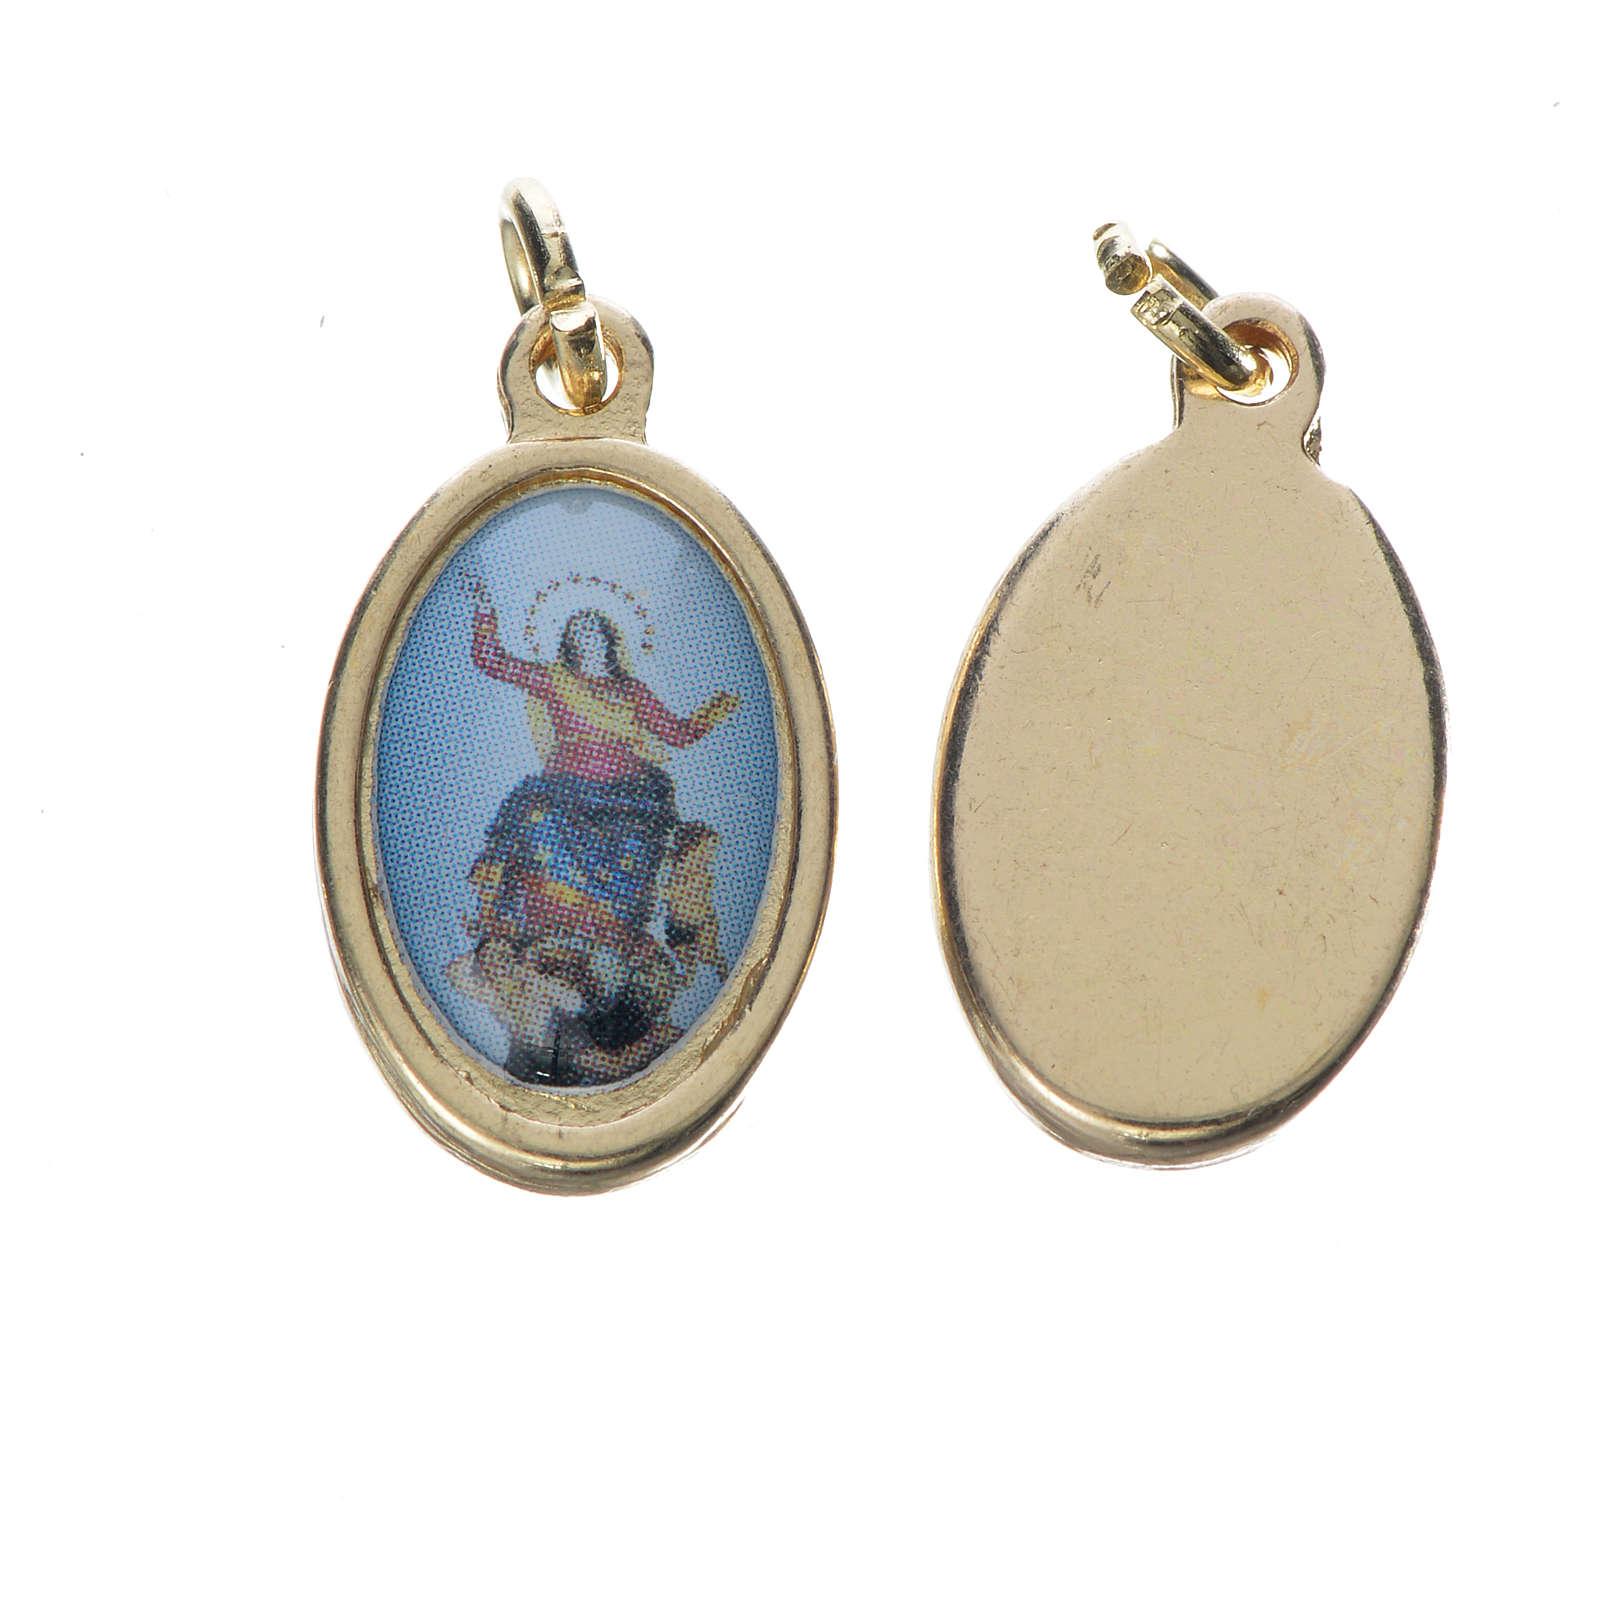 Notre Dame d'Utelle medal in golden metal, 1.5cm 4